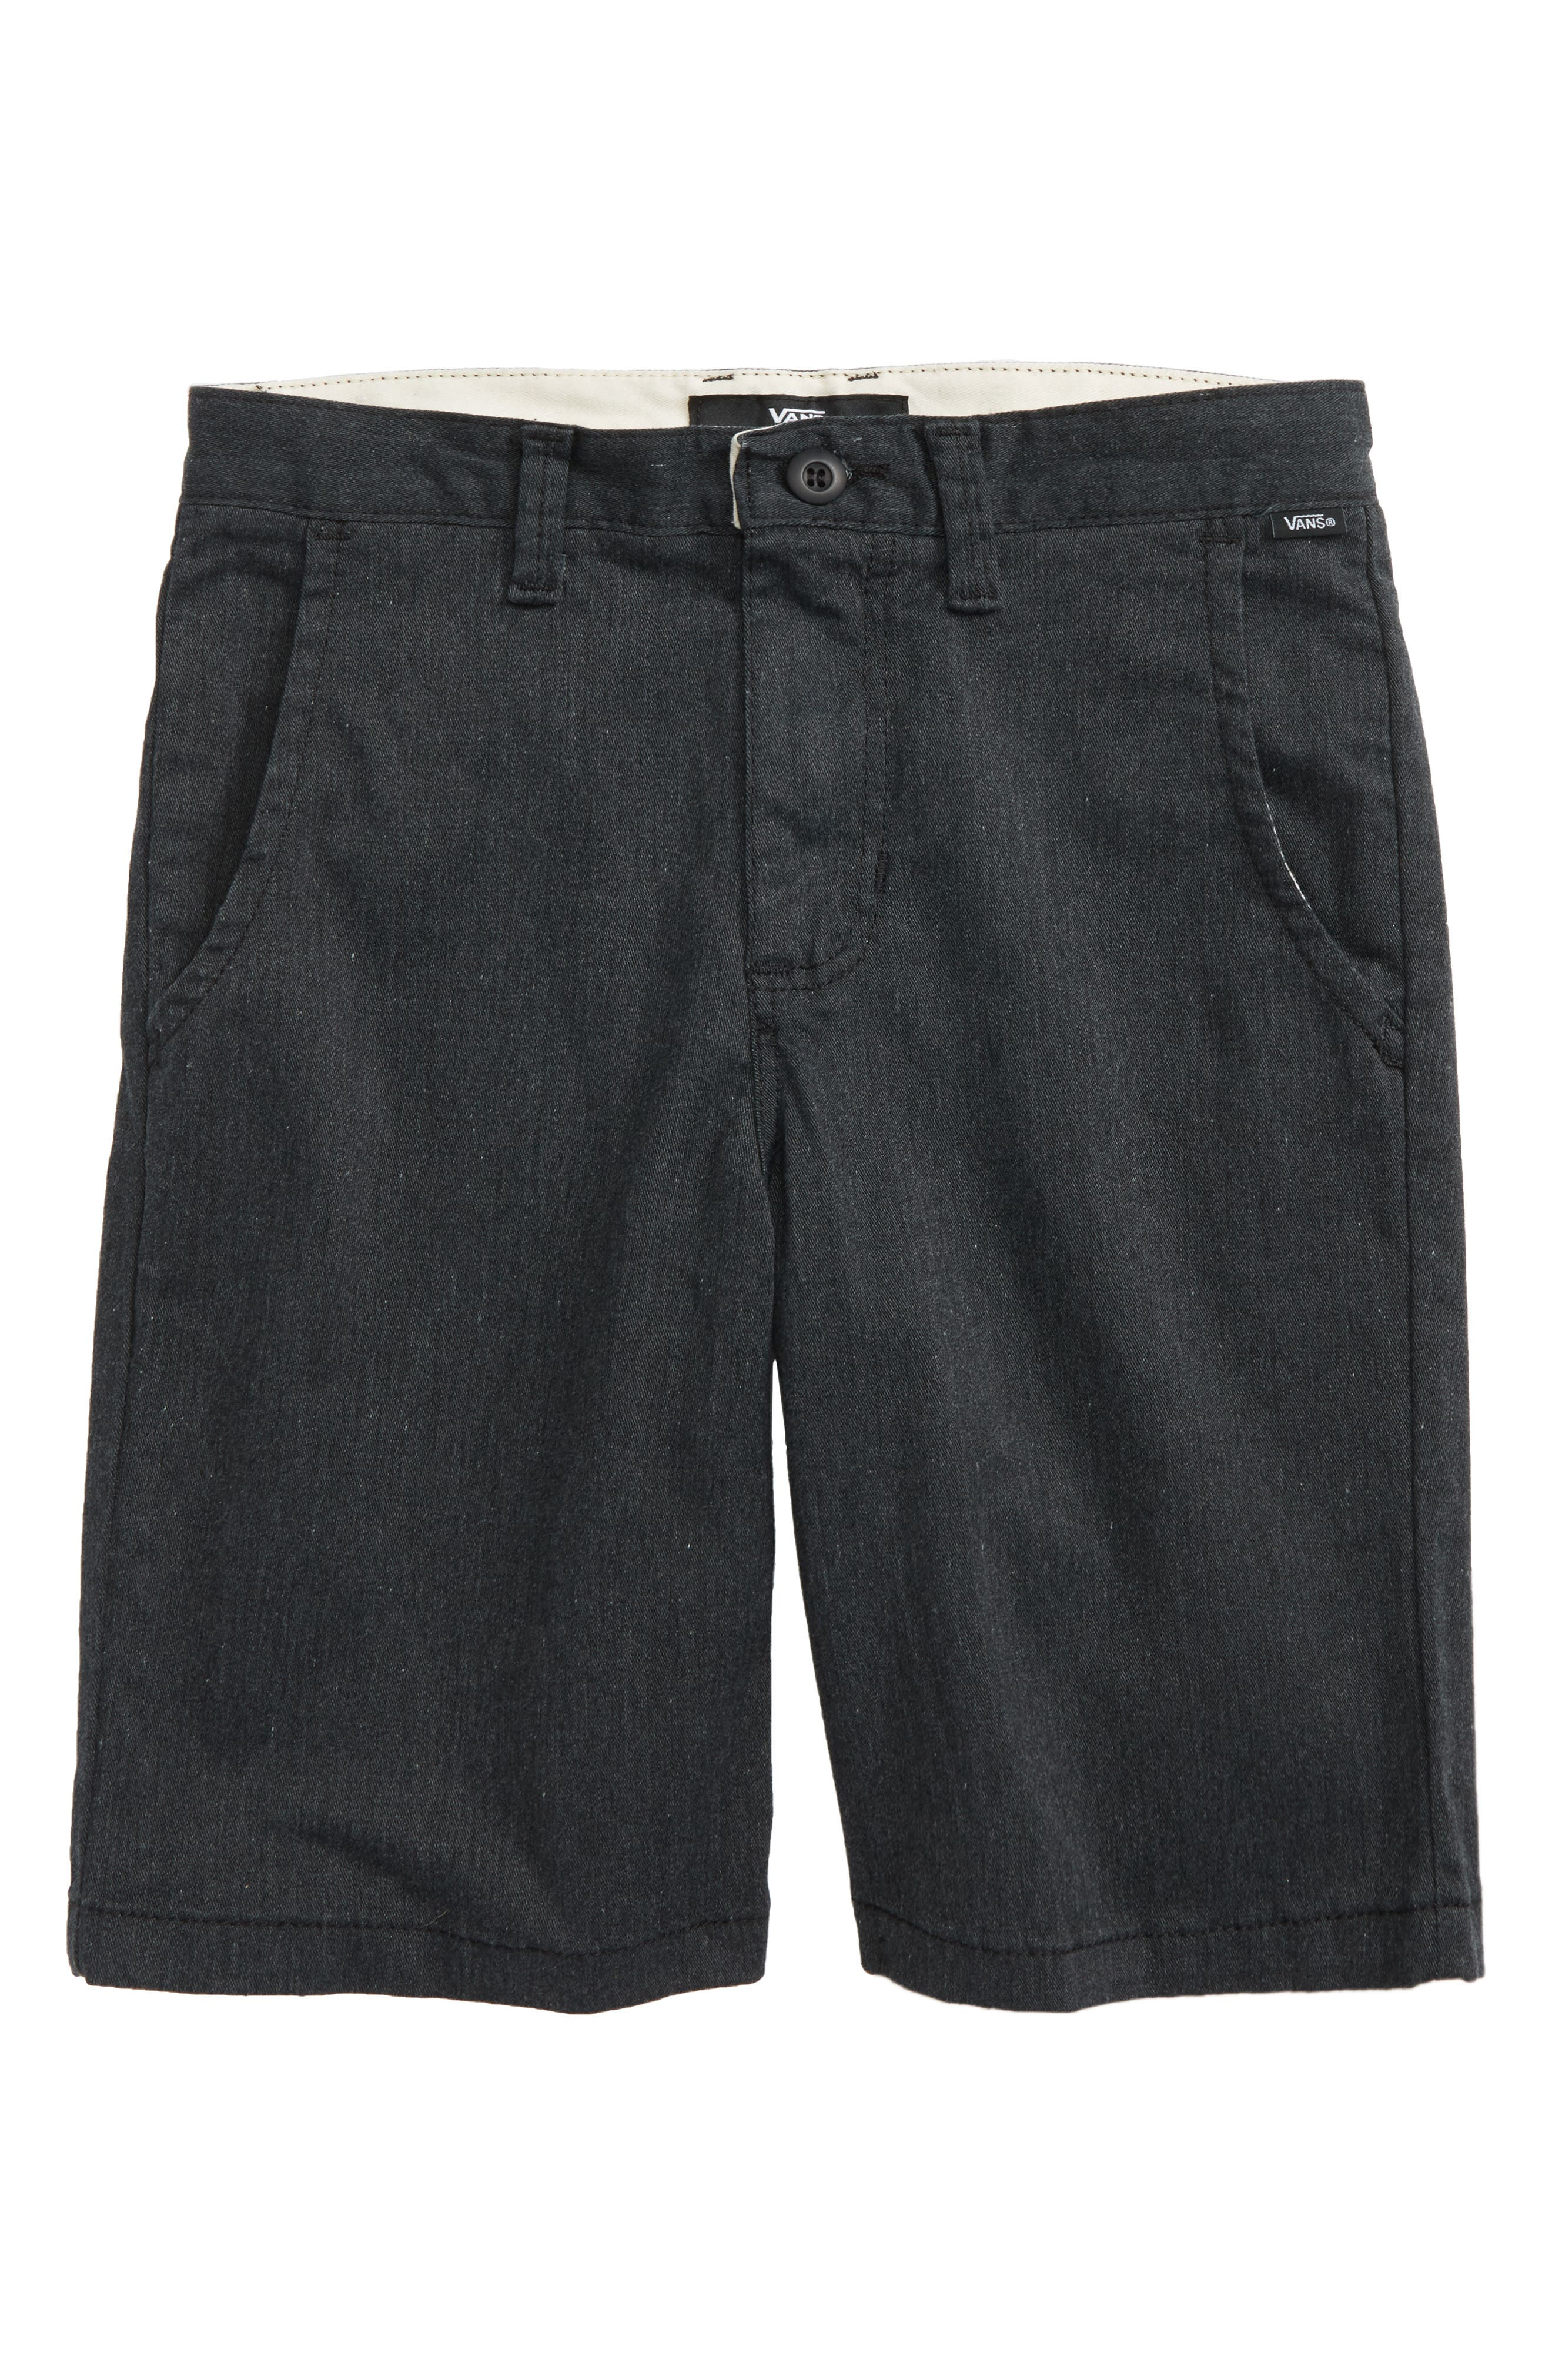 Vans Authentic Stretch Shorts (Big Boys)